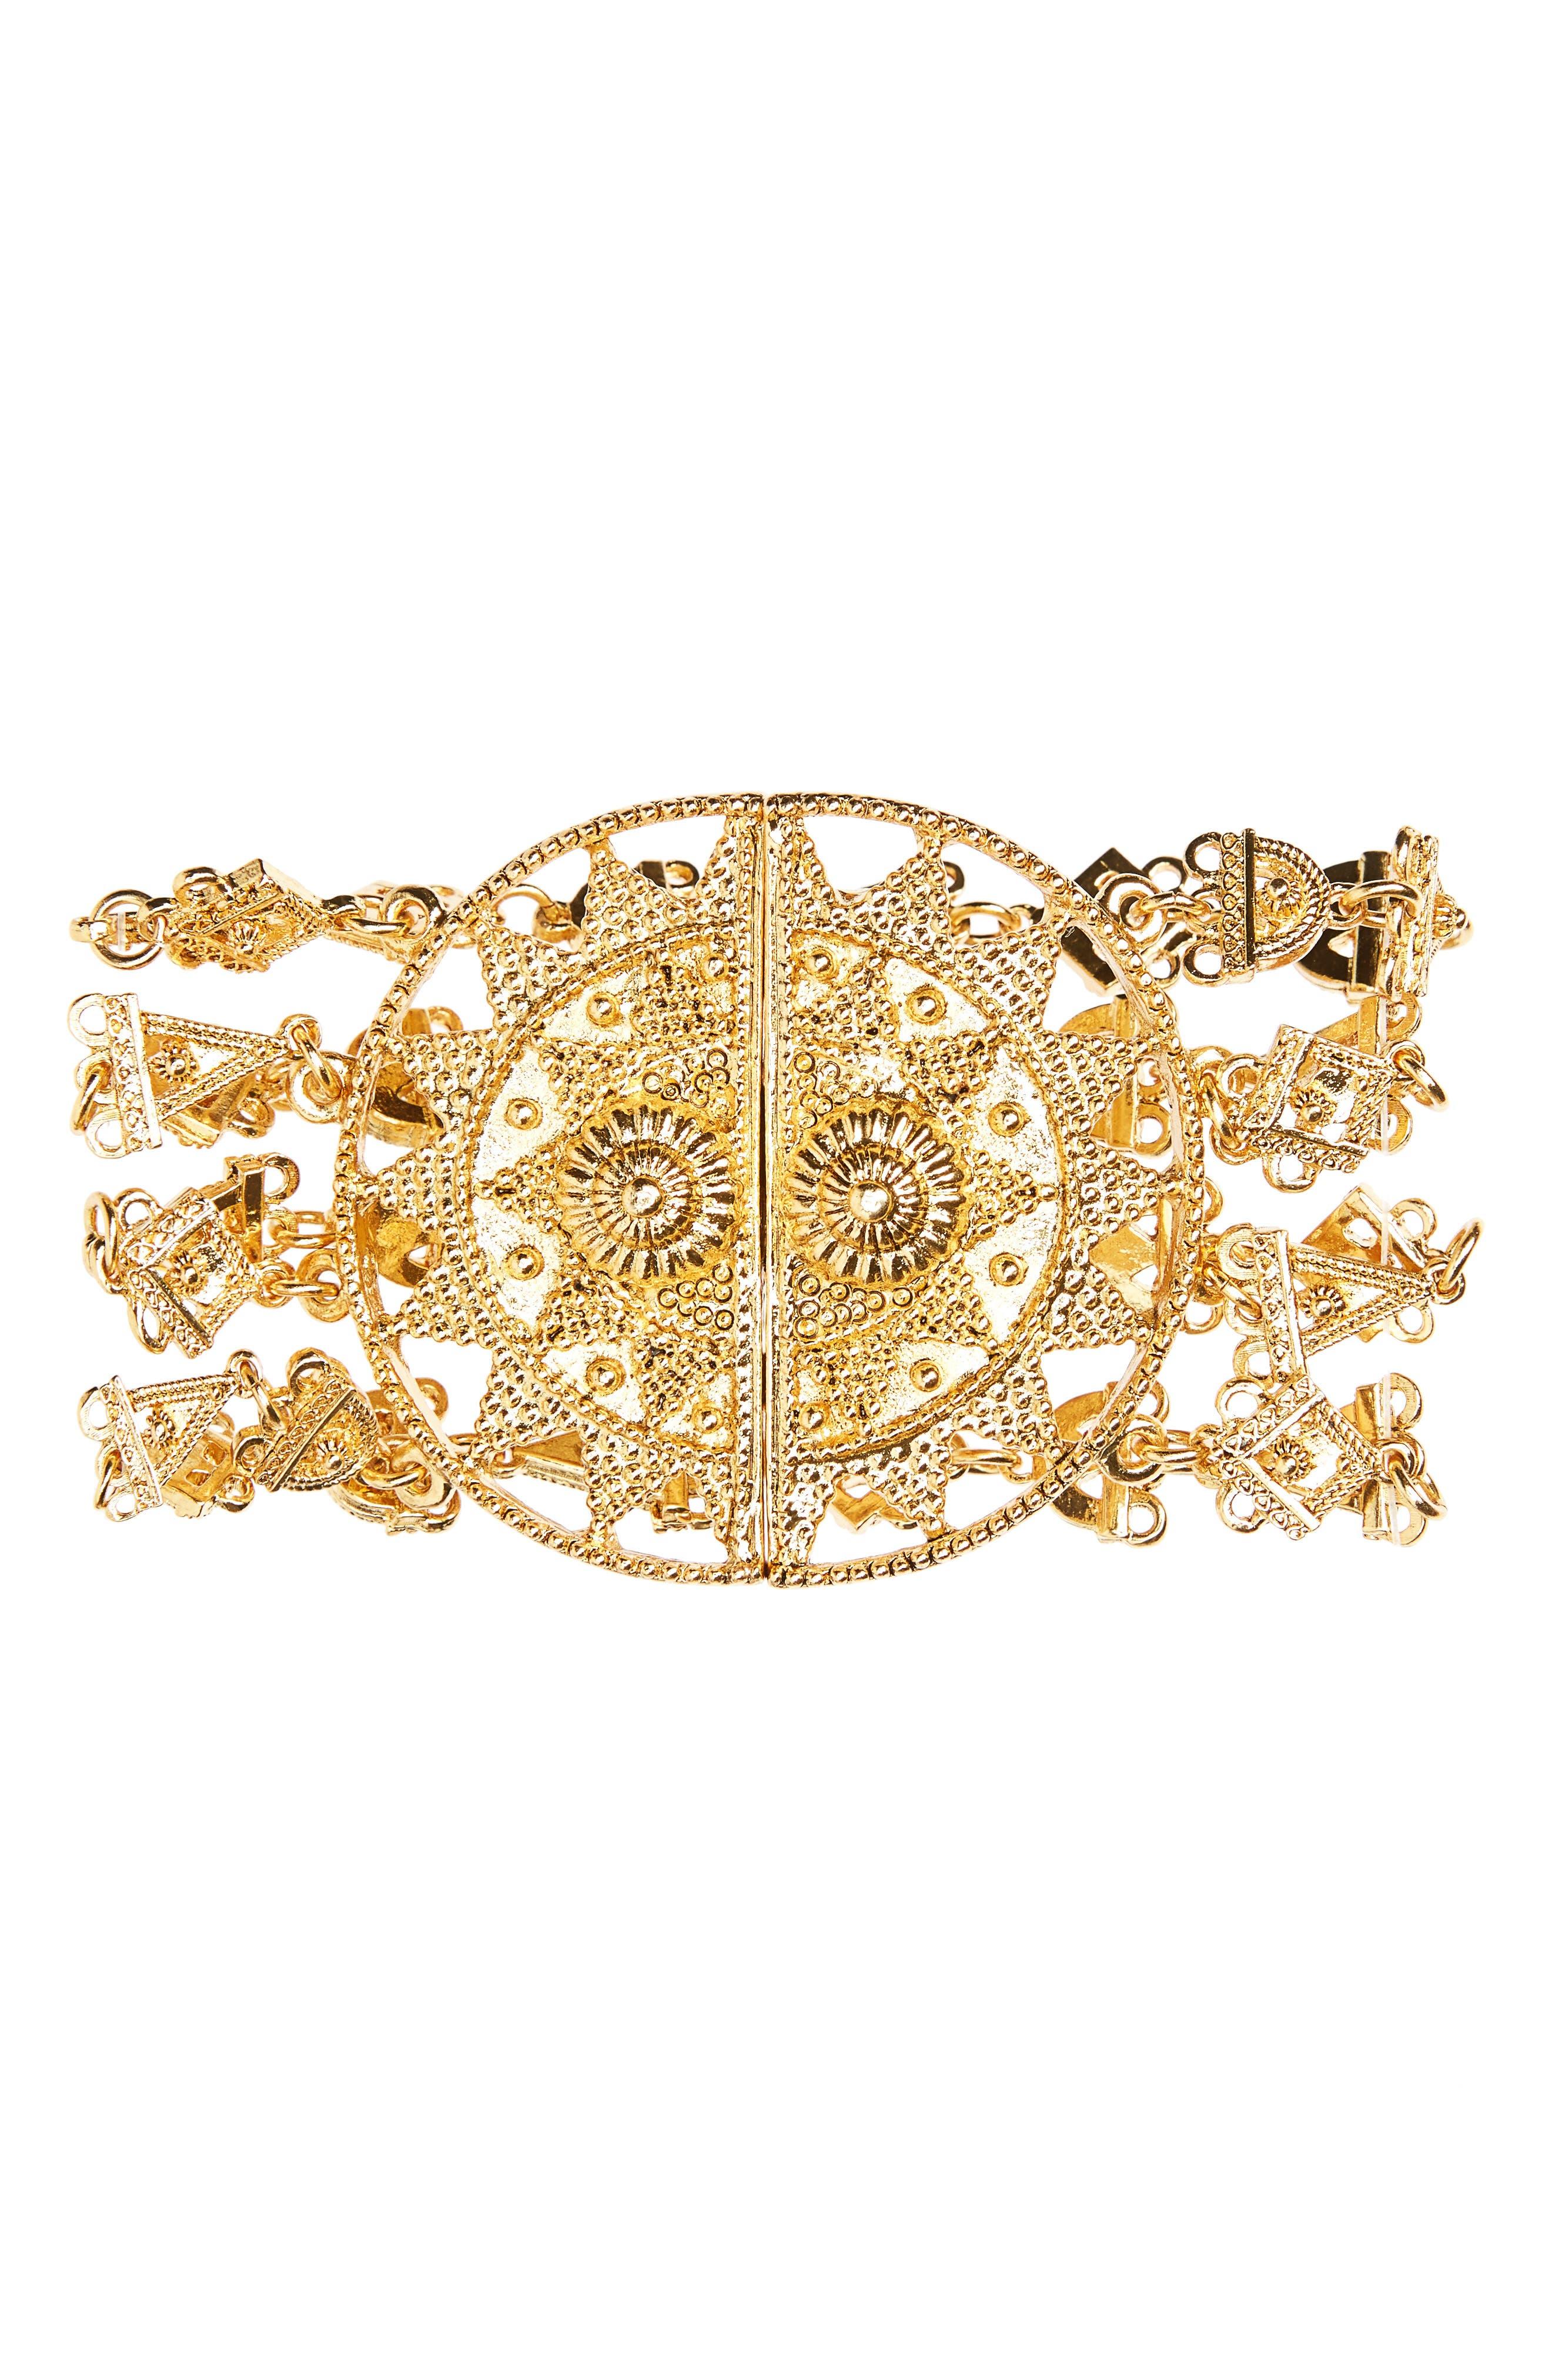 Main Image - Oscar de la Renta Charm Bracelet